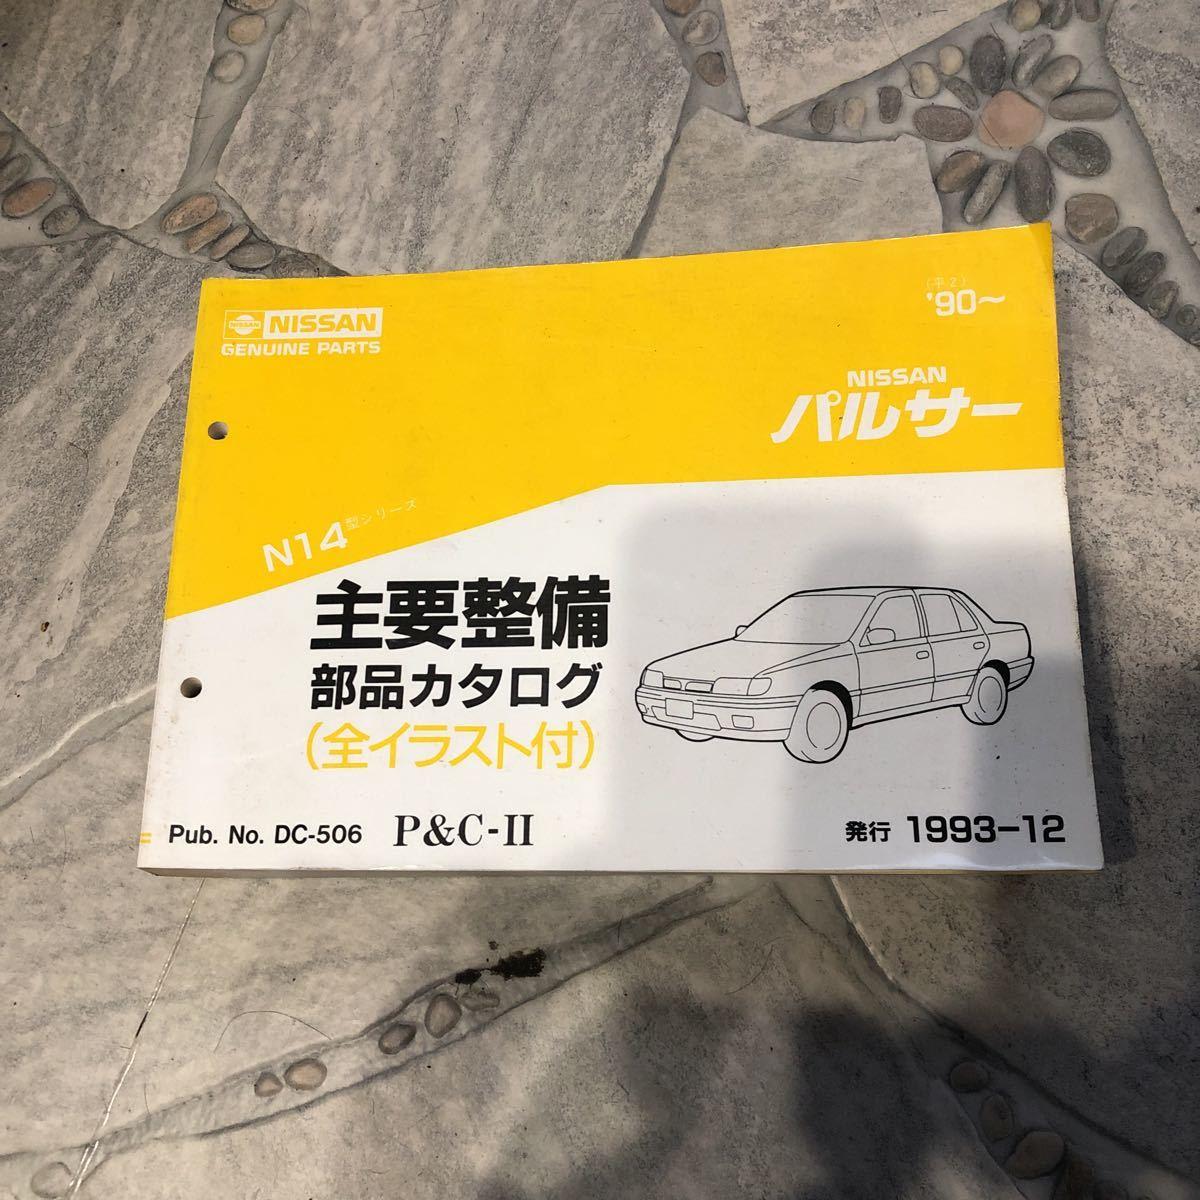 Nissan Pulsar N14 type series 90~ used main maintenance